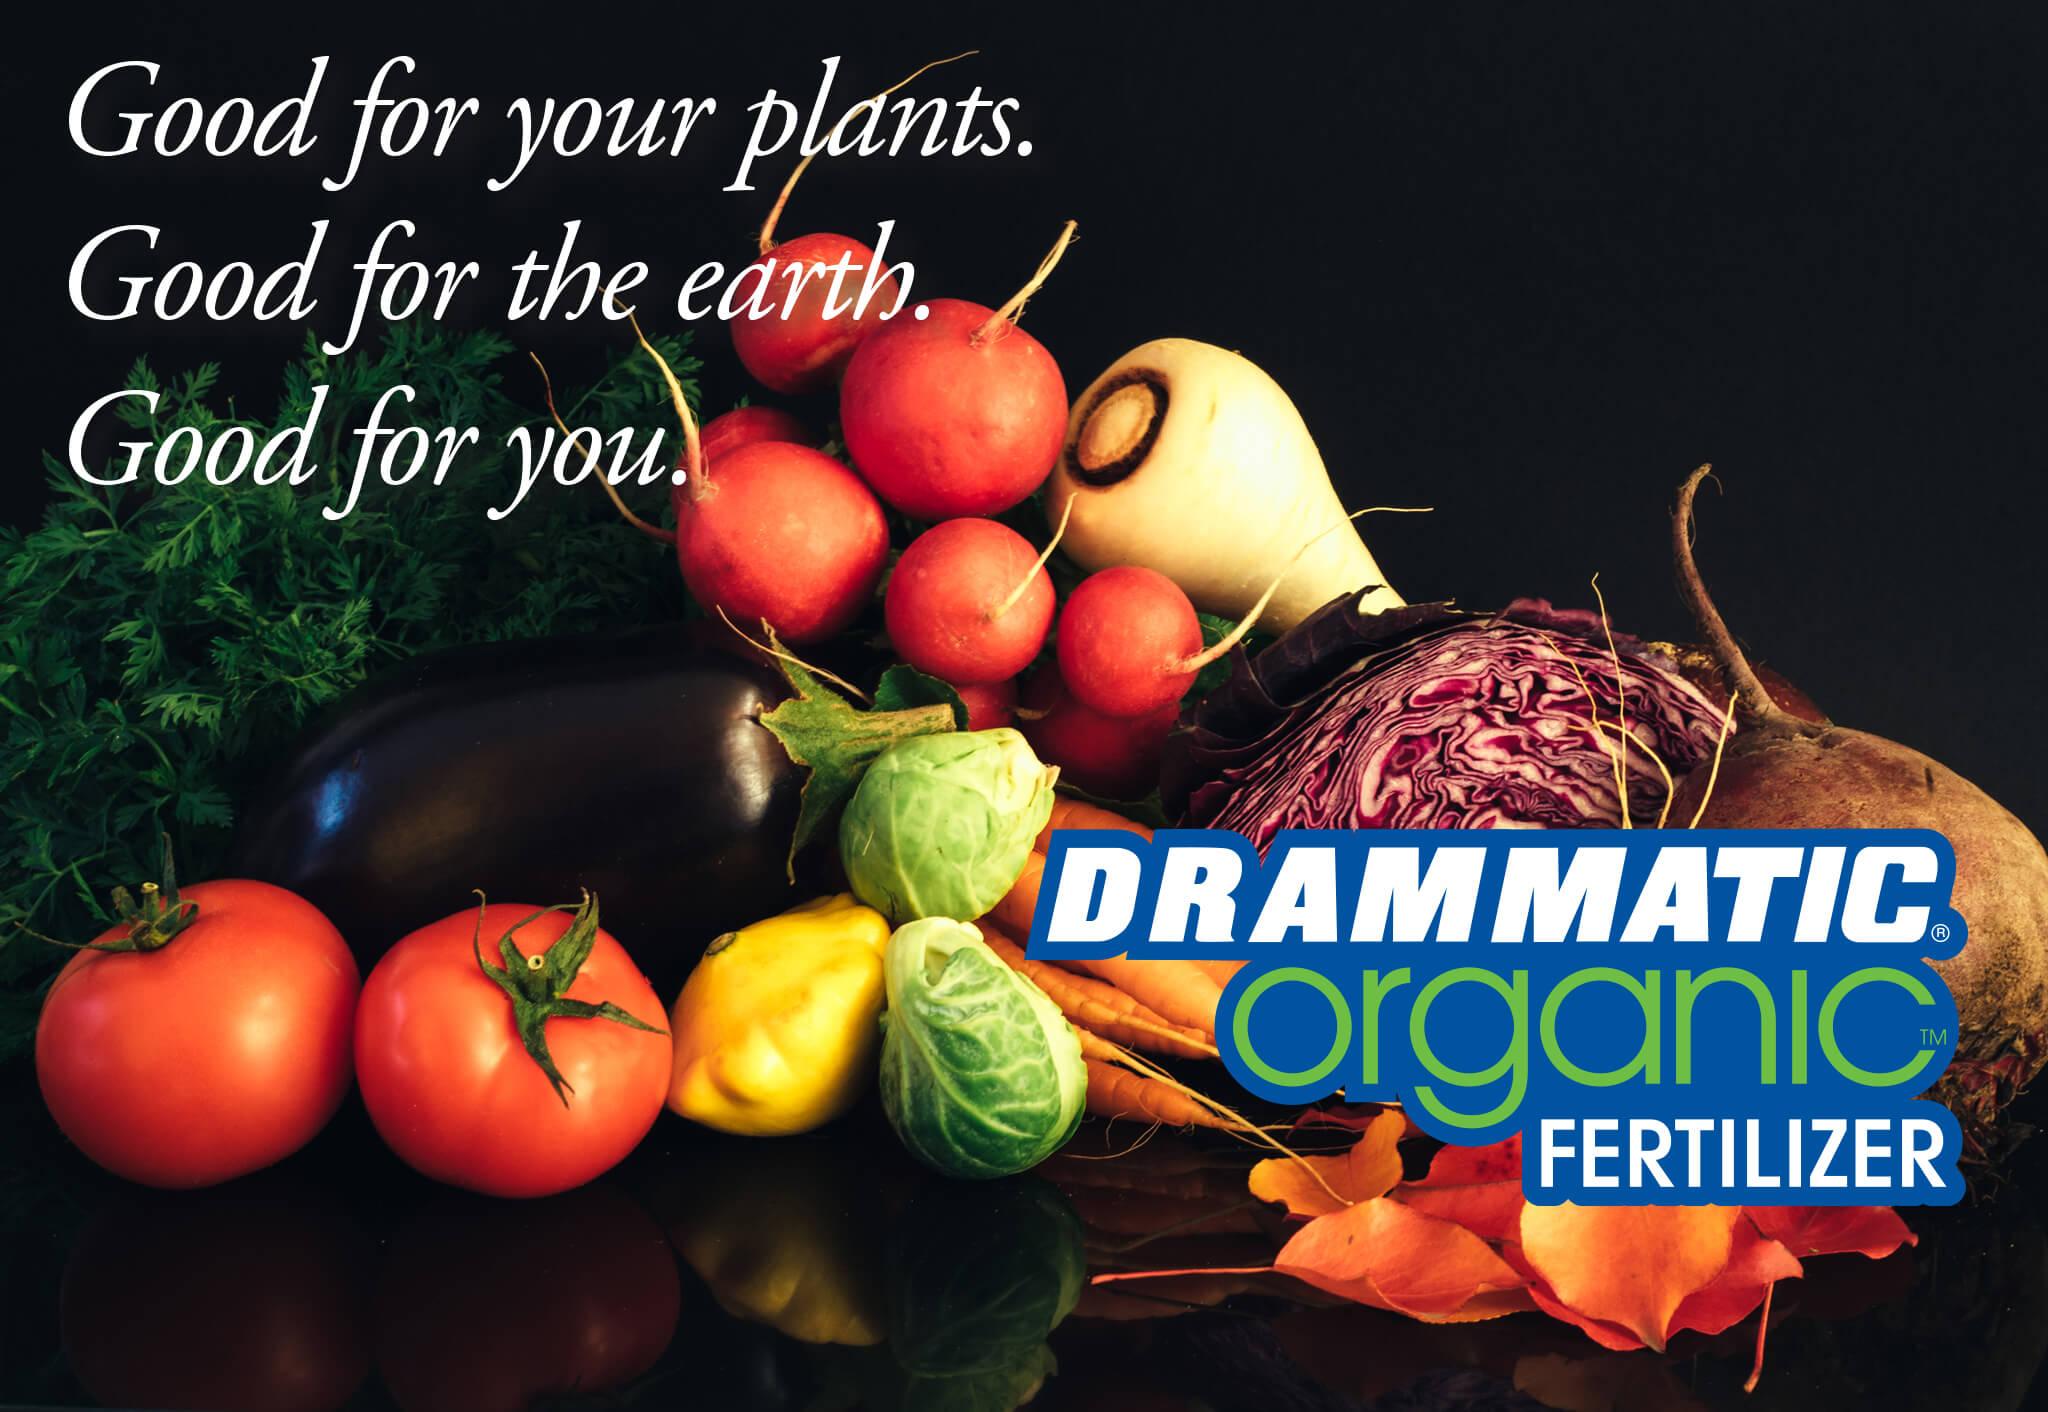 Good for you. A premium fertilizer for organic crops.